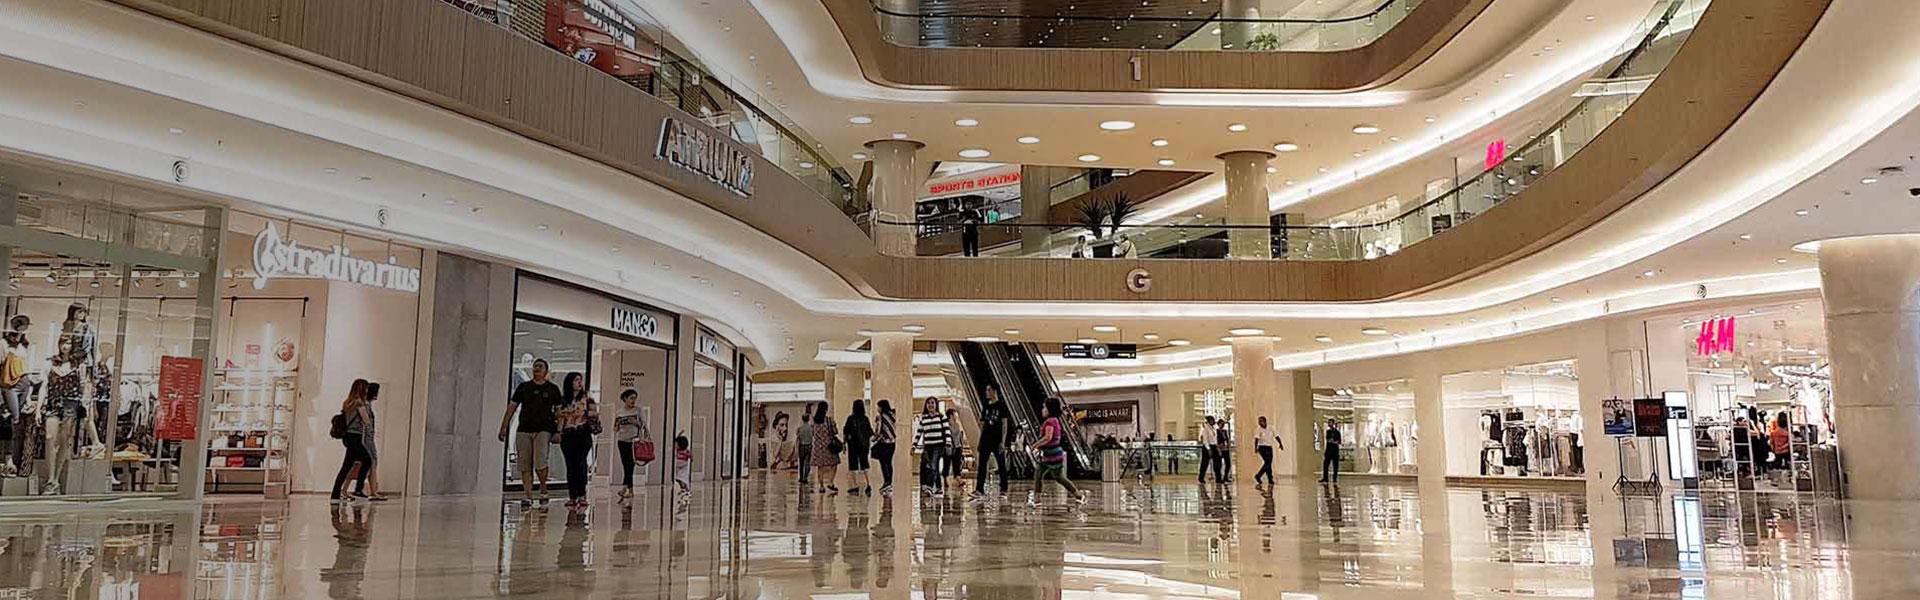 03-pkw-properties-mall